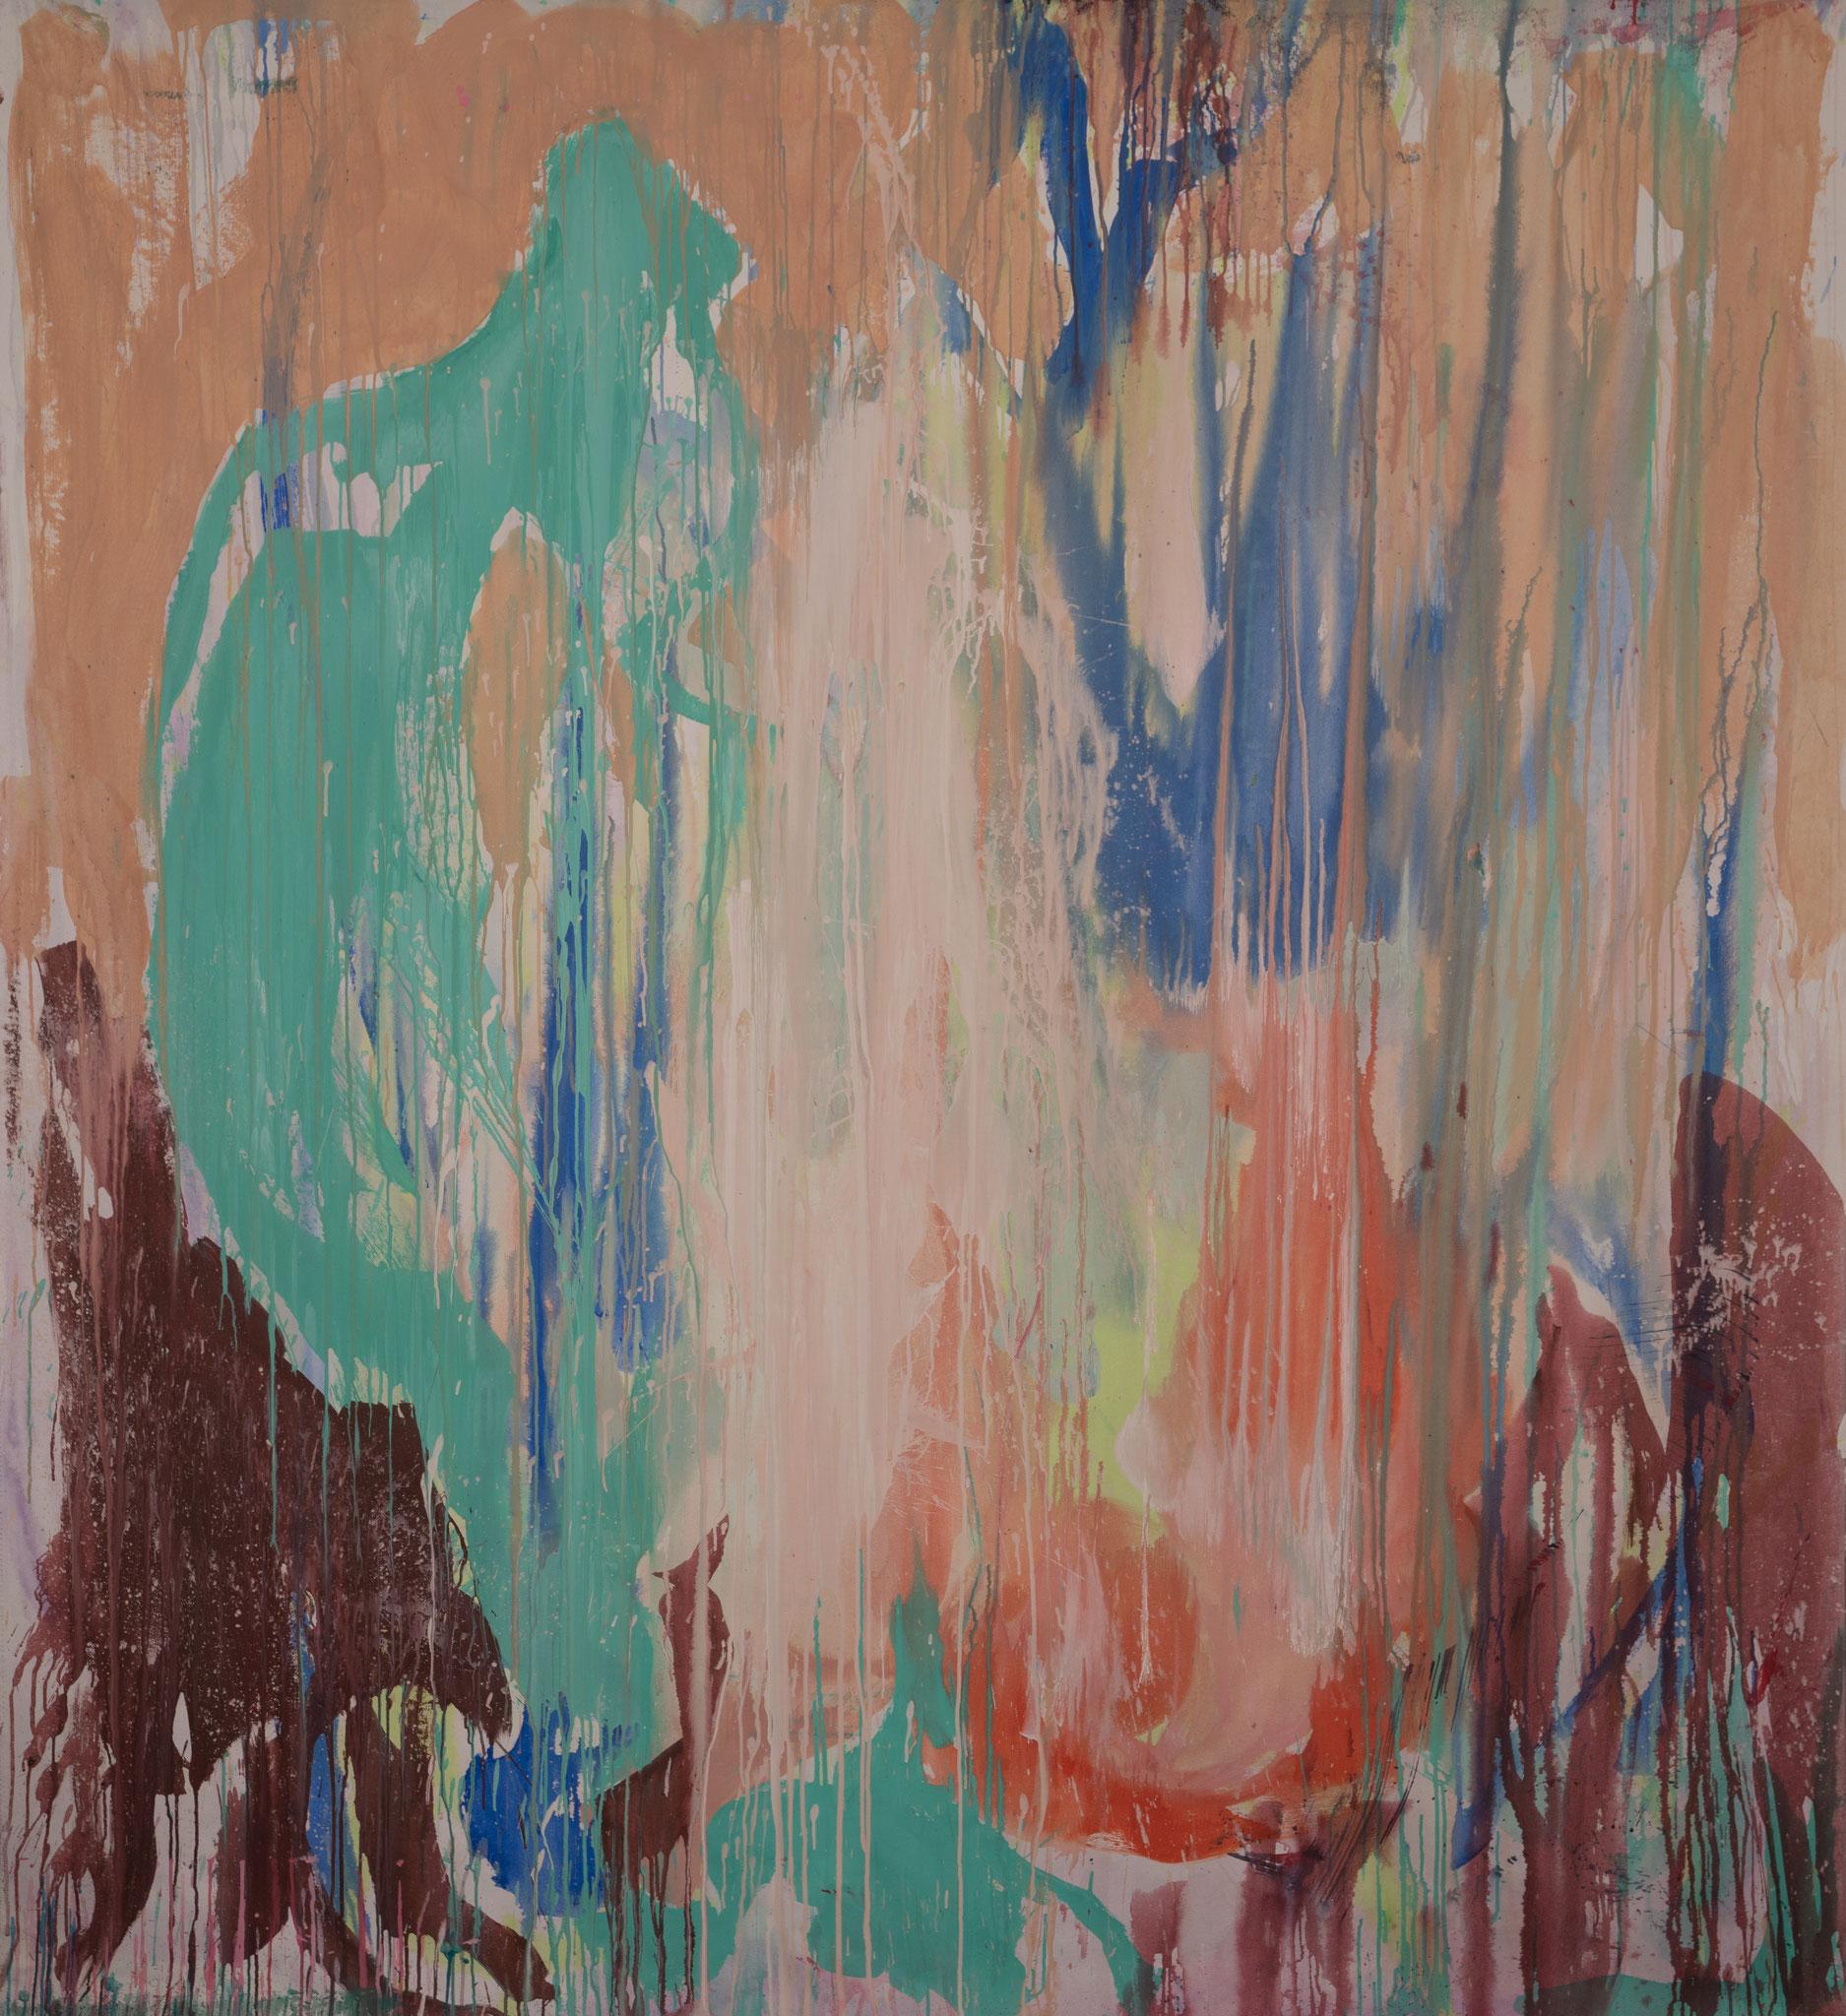 """Forest Dream"" 220 x 200 cm - Acryl auf Leinwand"